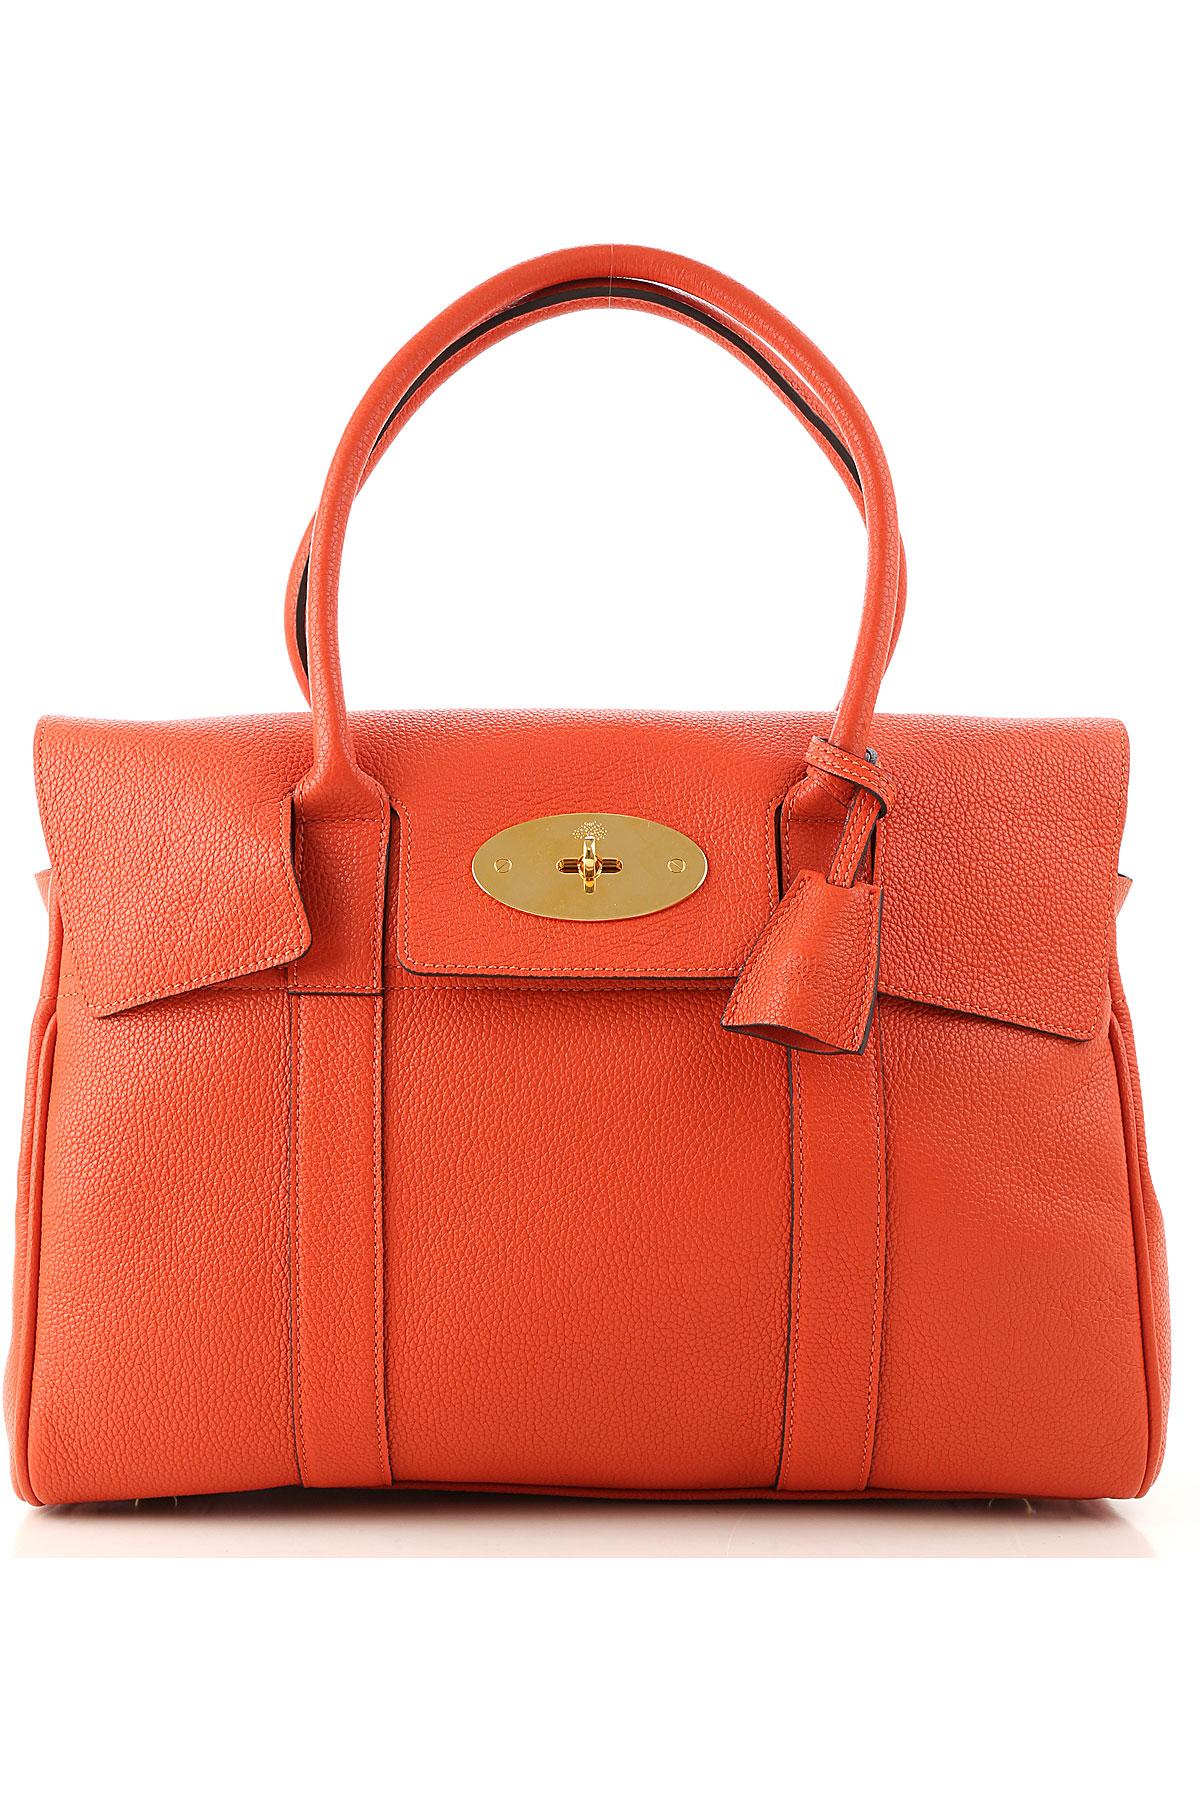 Mulberry Tote Bag On Sale, Tangerine Orange, Leather, 2019